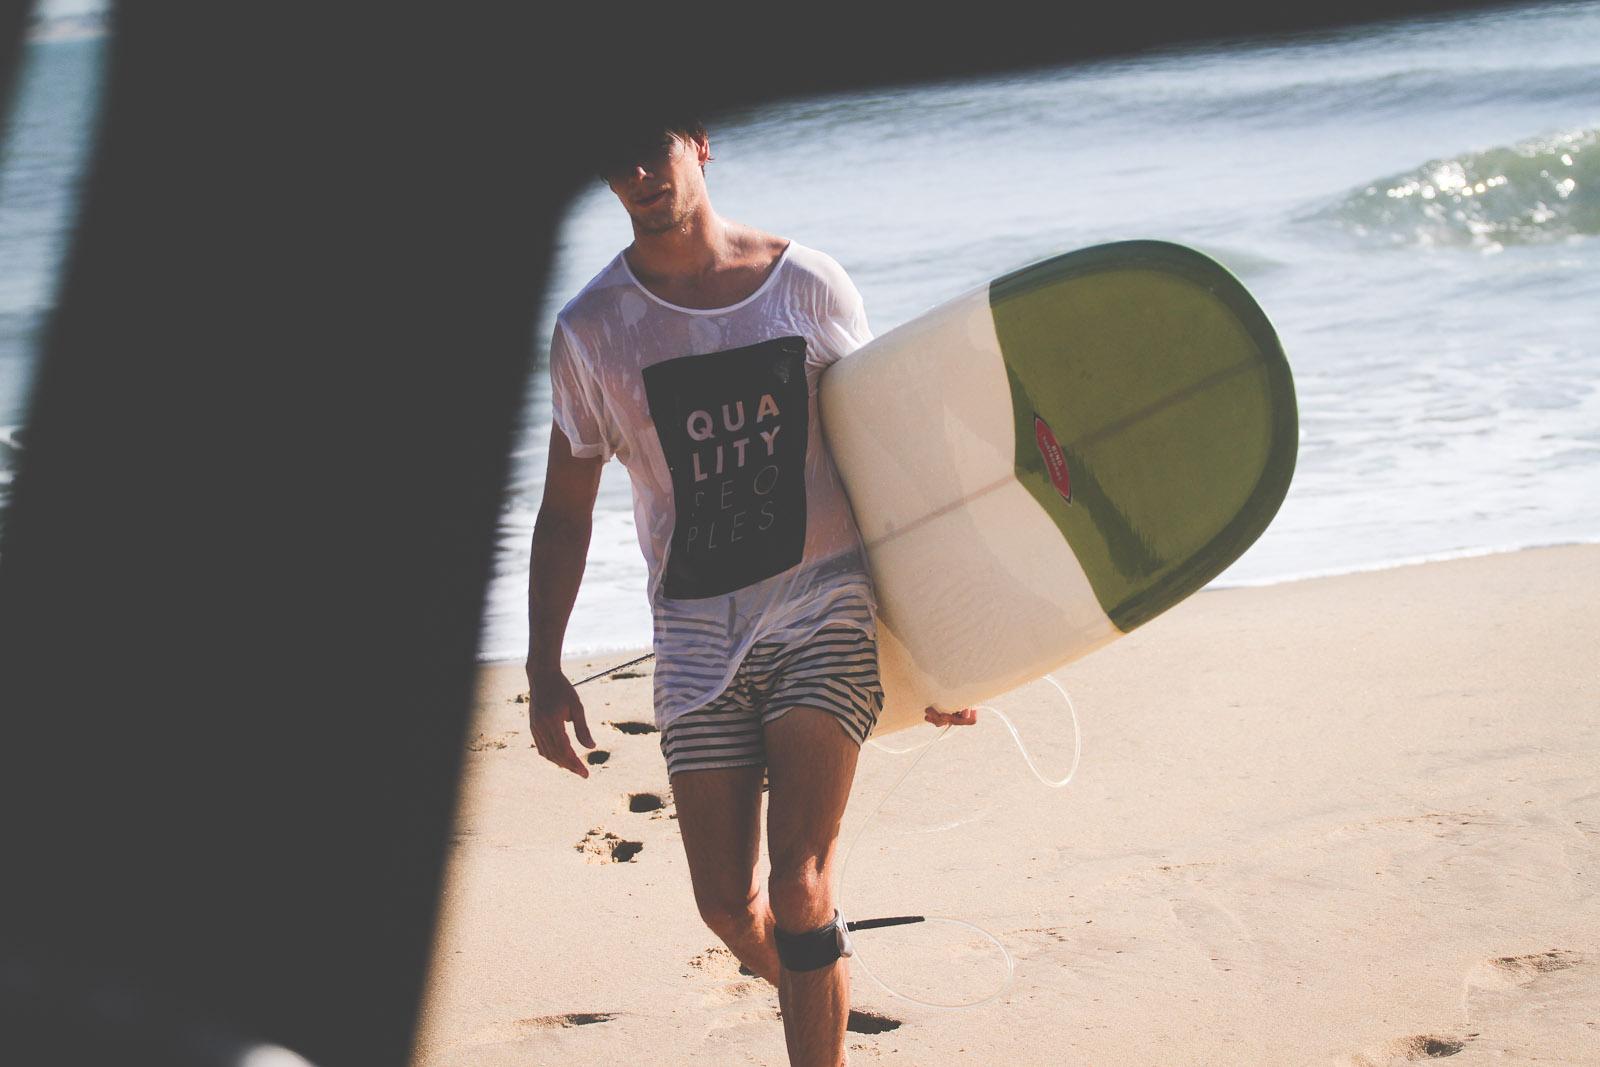 Sunshinestories-surf-travel-blog-IMG_9281